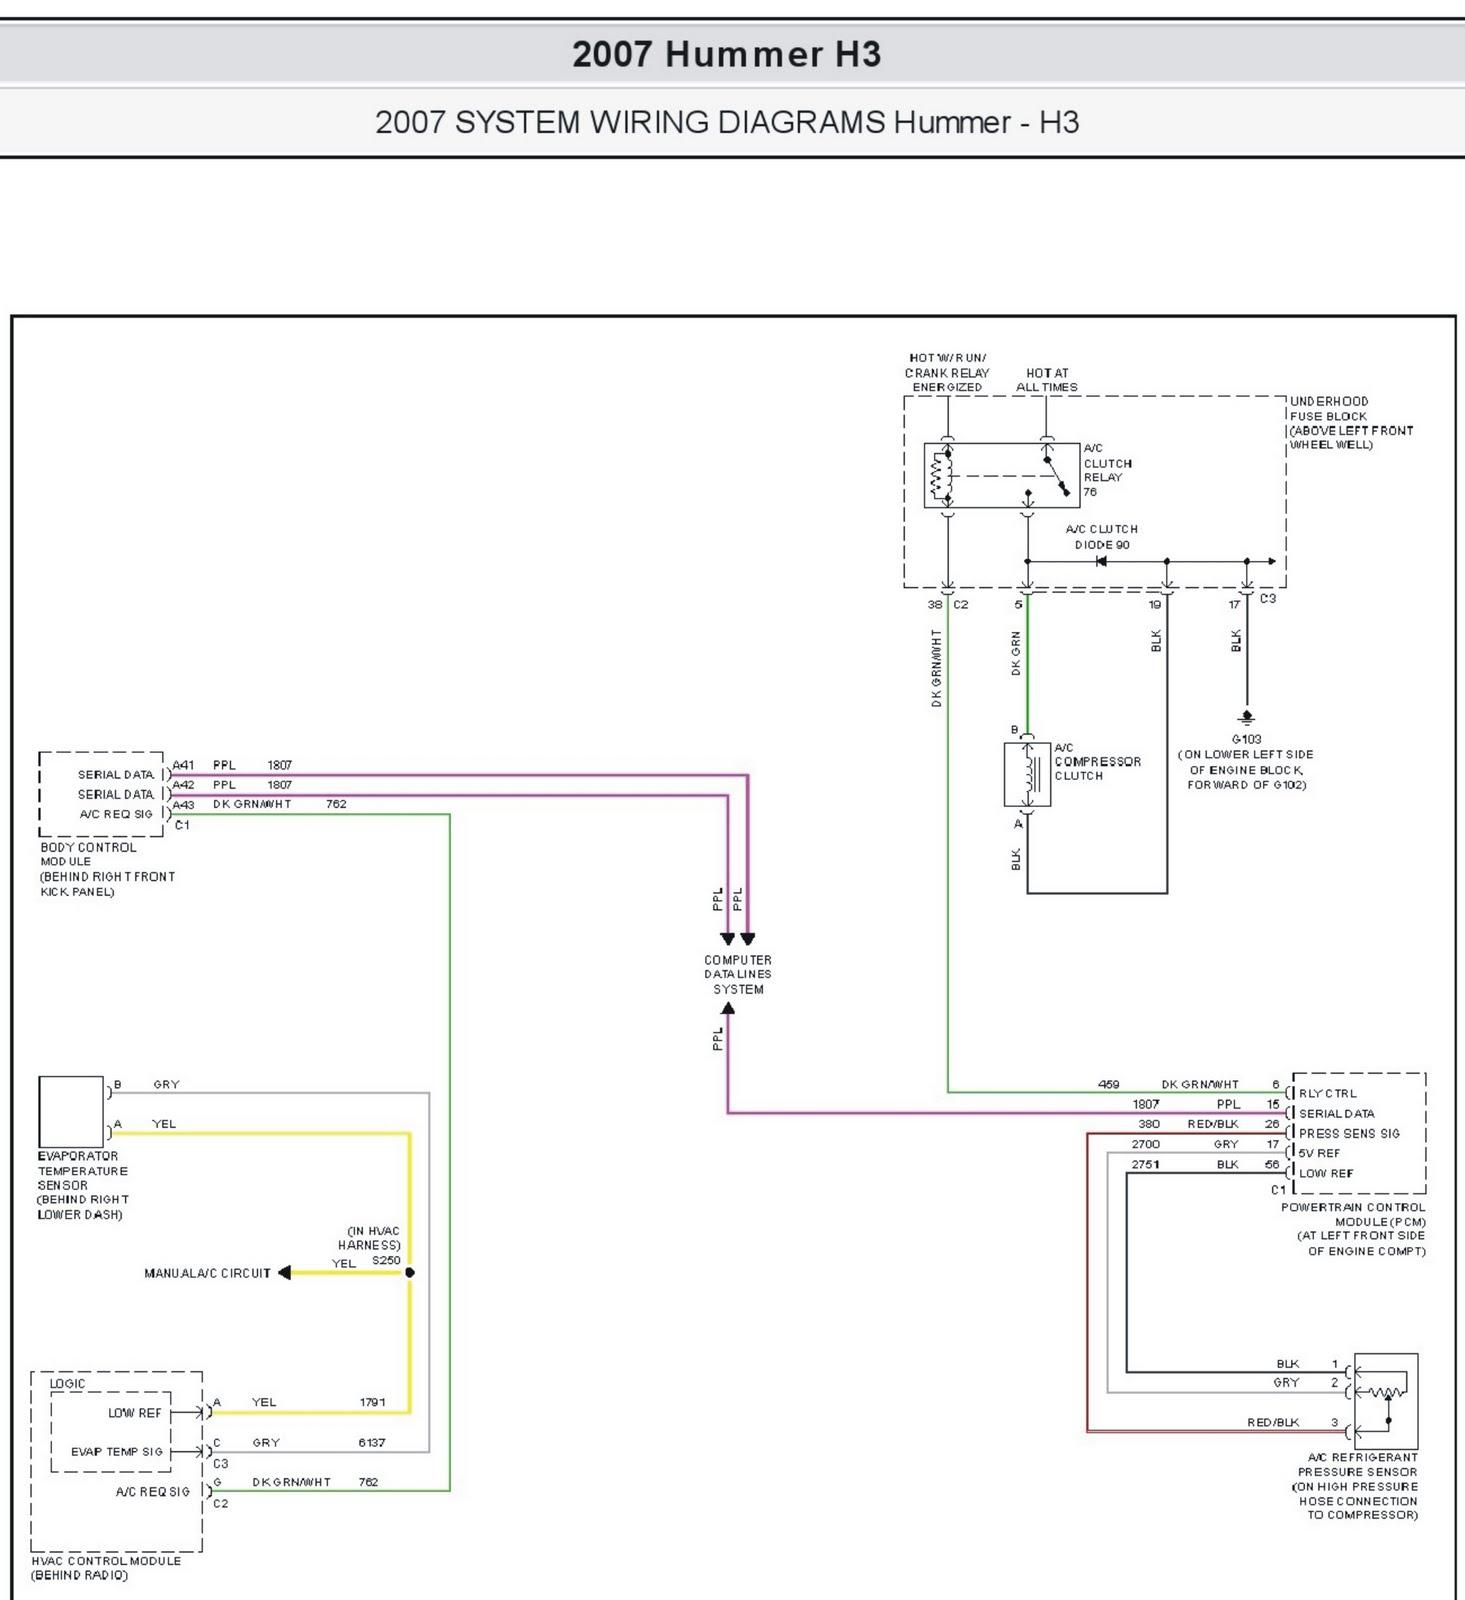 2006 hummer h3 parts diagrams 1996 ford ranger radio wiring diagram schematic data site